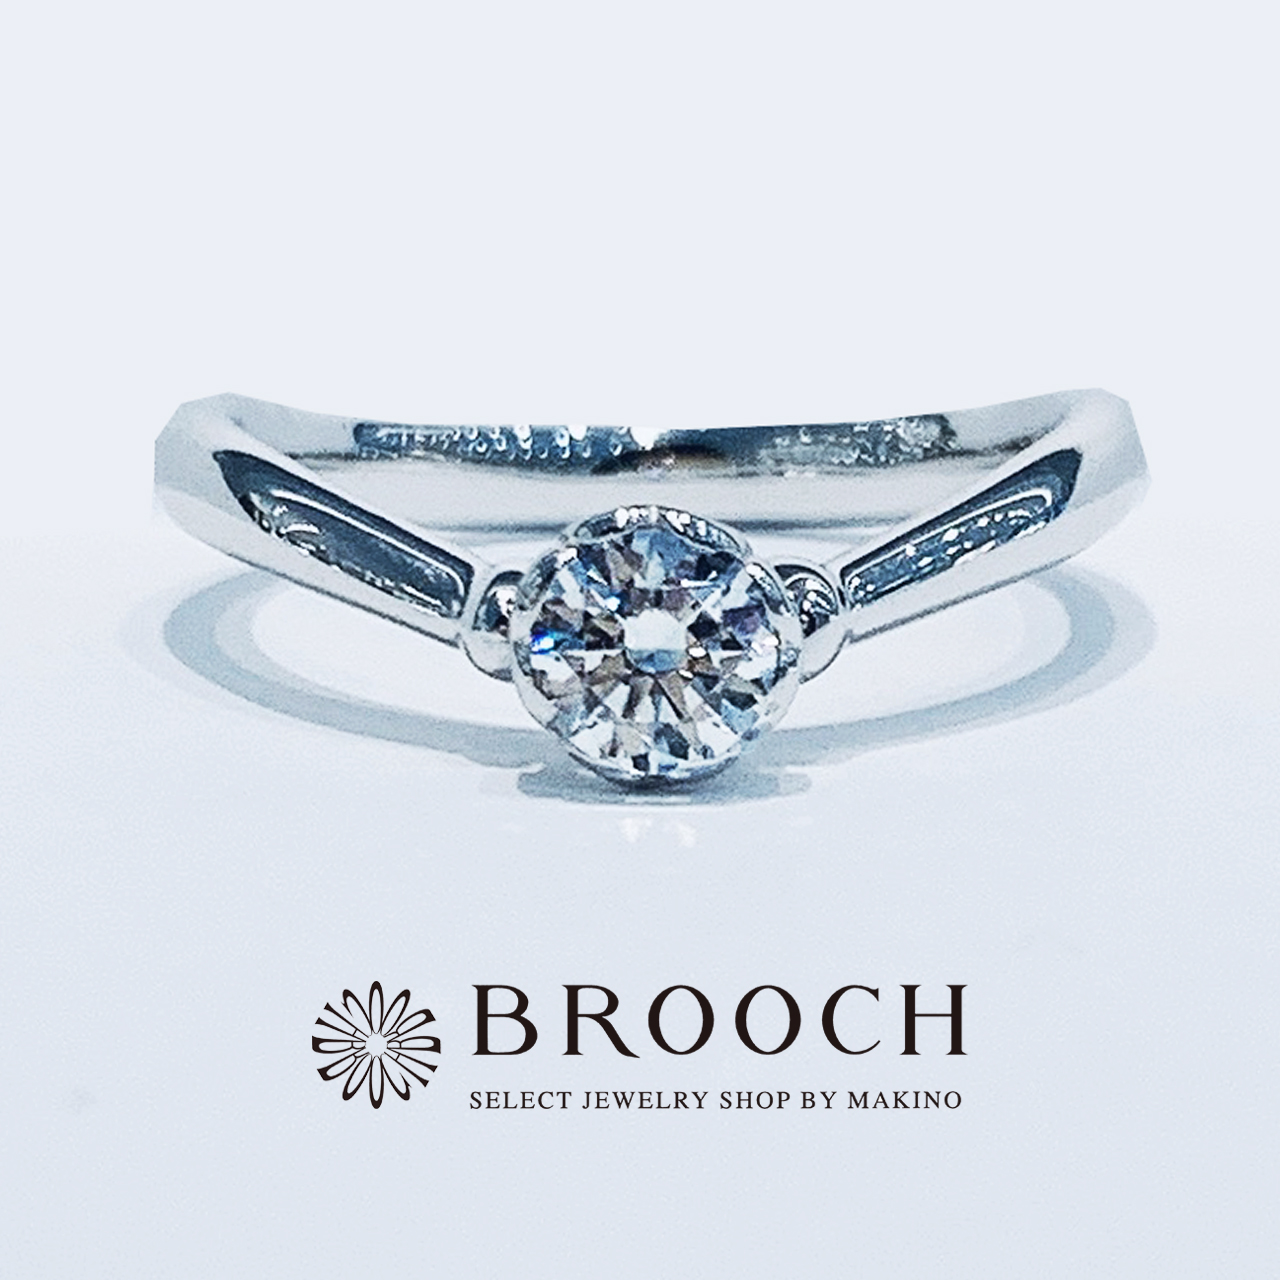 BROOCH 婚約指輪 エンゲージリング シンプル1石V字デザイン